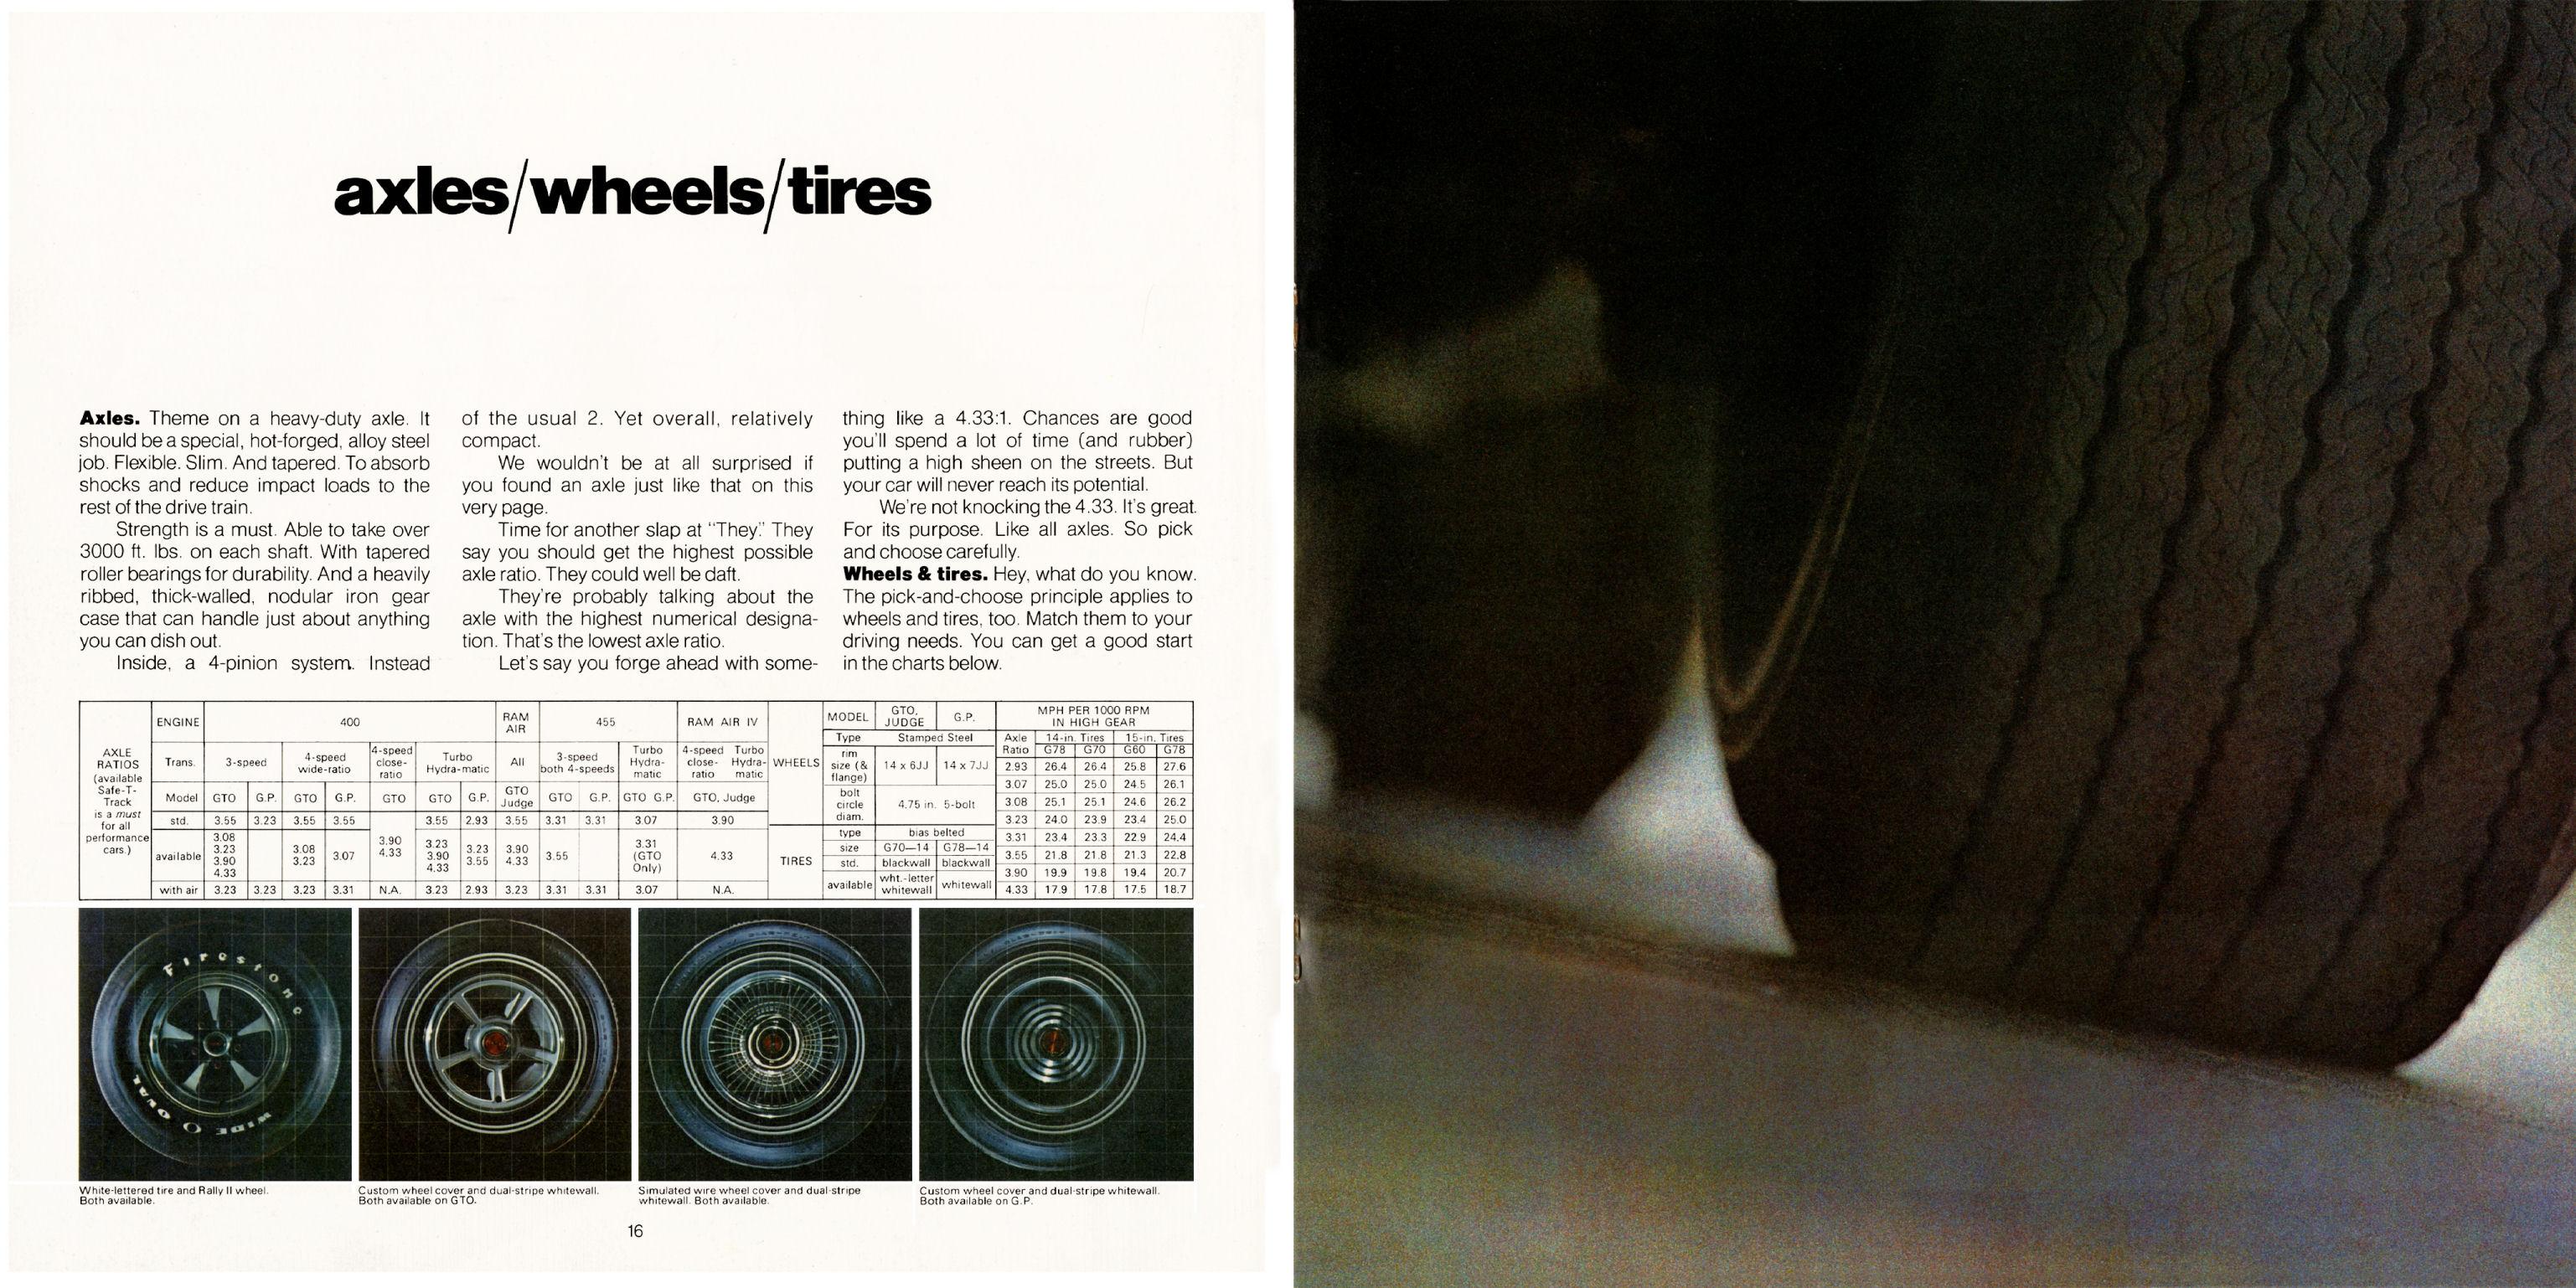 1970%20Pontiac%20Performance-16-17.jpg